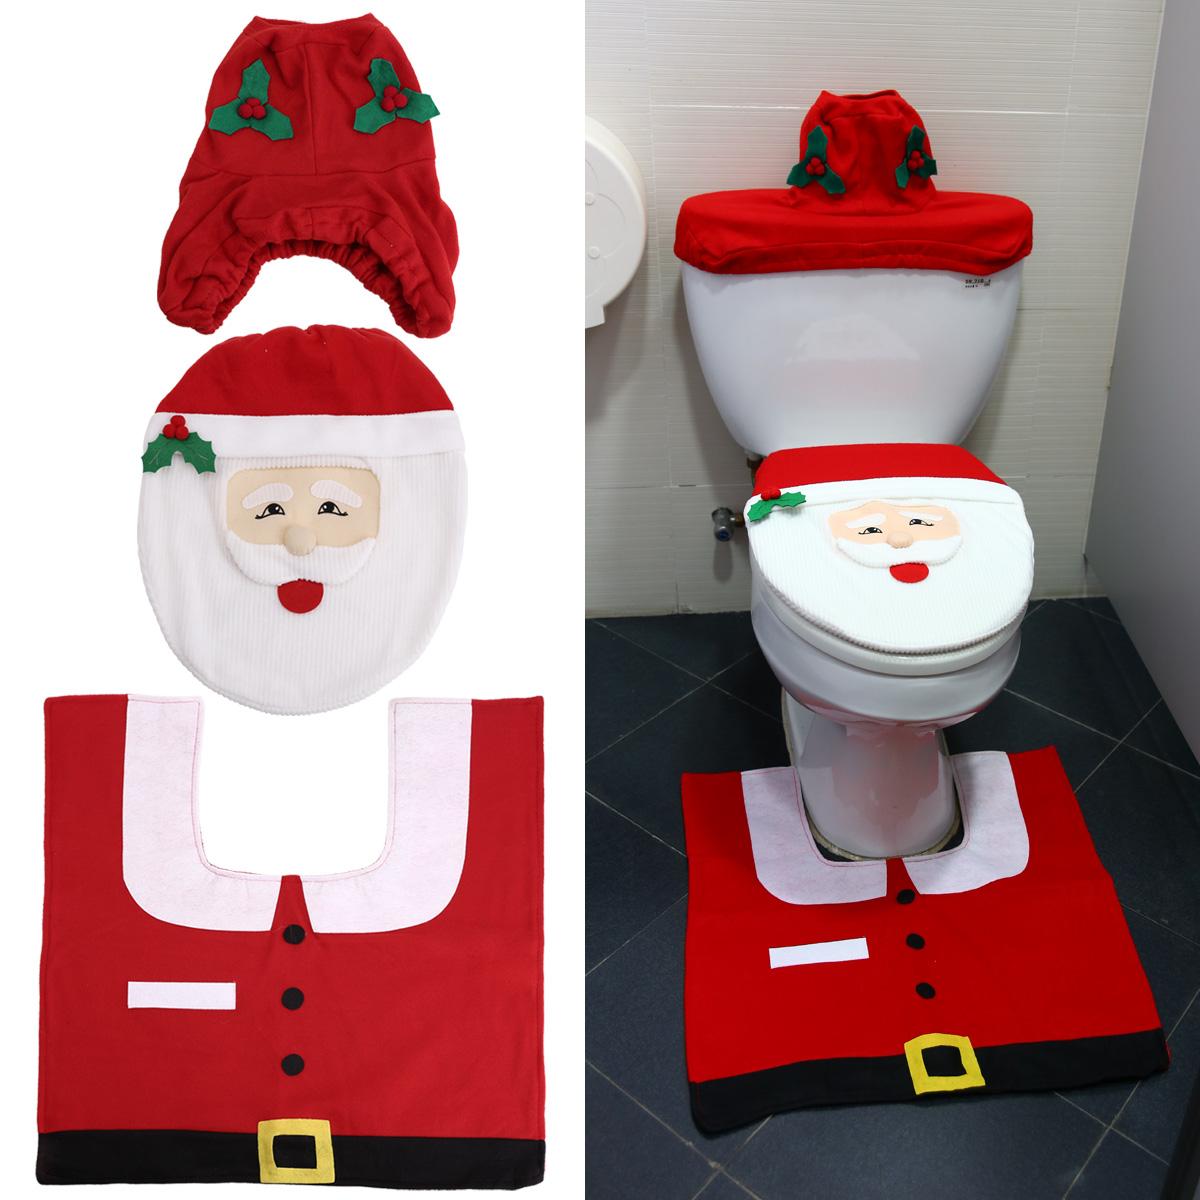 Christmas Bathroom Accessories Uk: 3 X Christmas Decorations Santa Decor Toilet Seat Cover